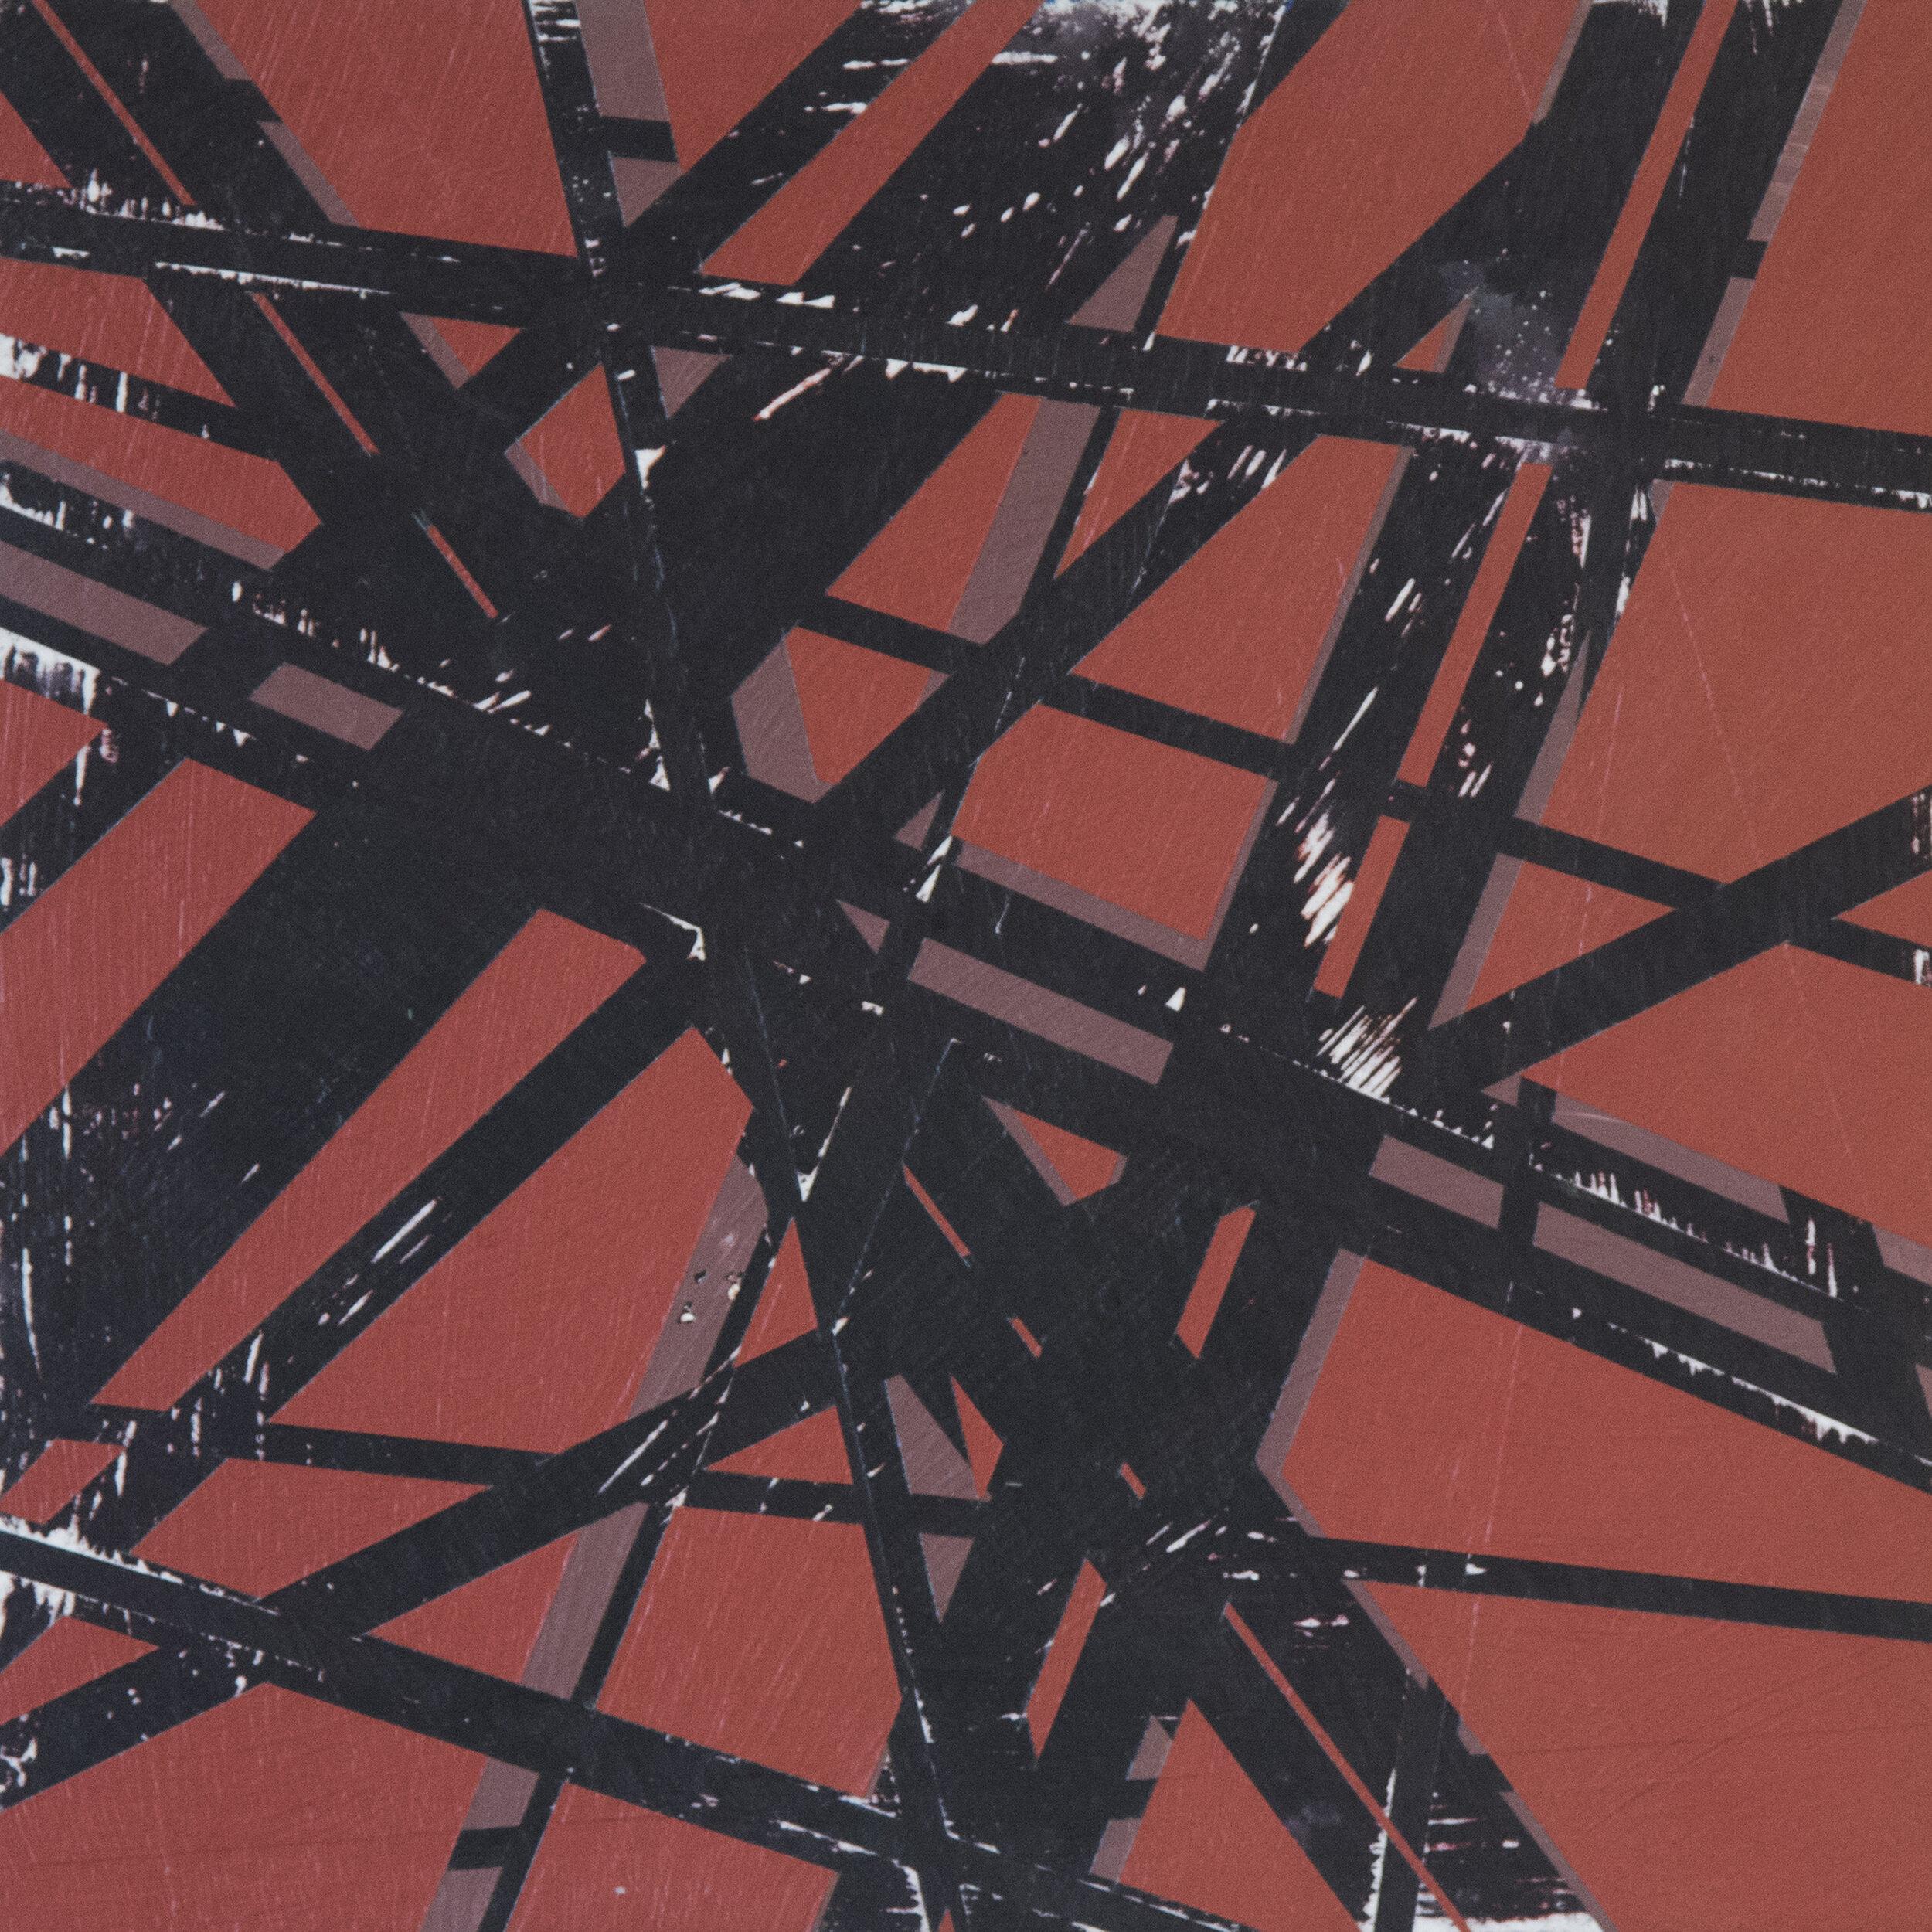 Daniel_Stuelpnagel-_Complex_Vector_Space_-12x12_-acryliconwoodpanel-2019-$150.jpg